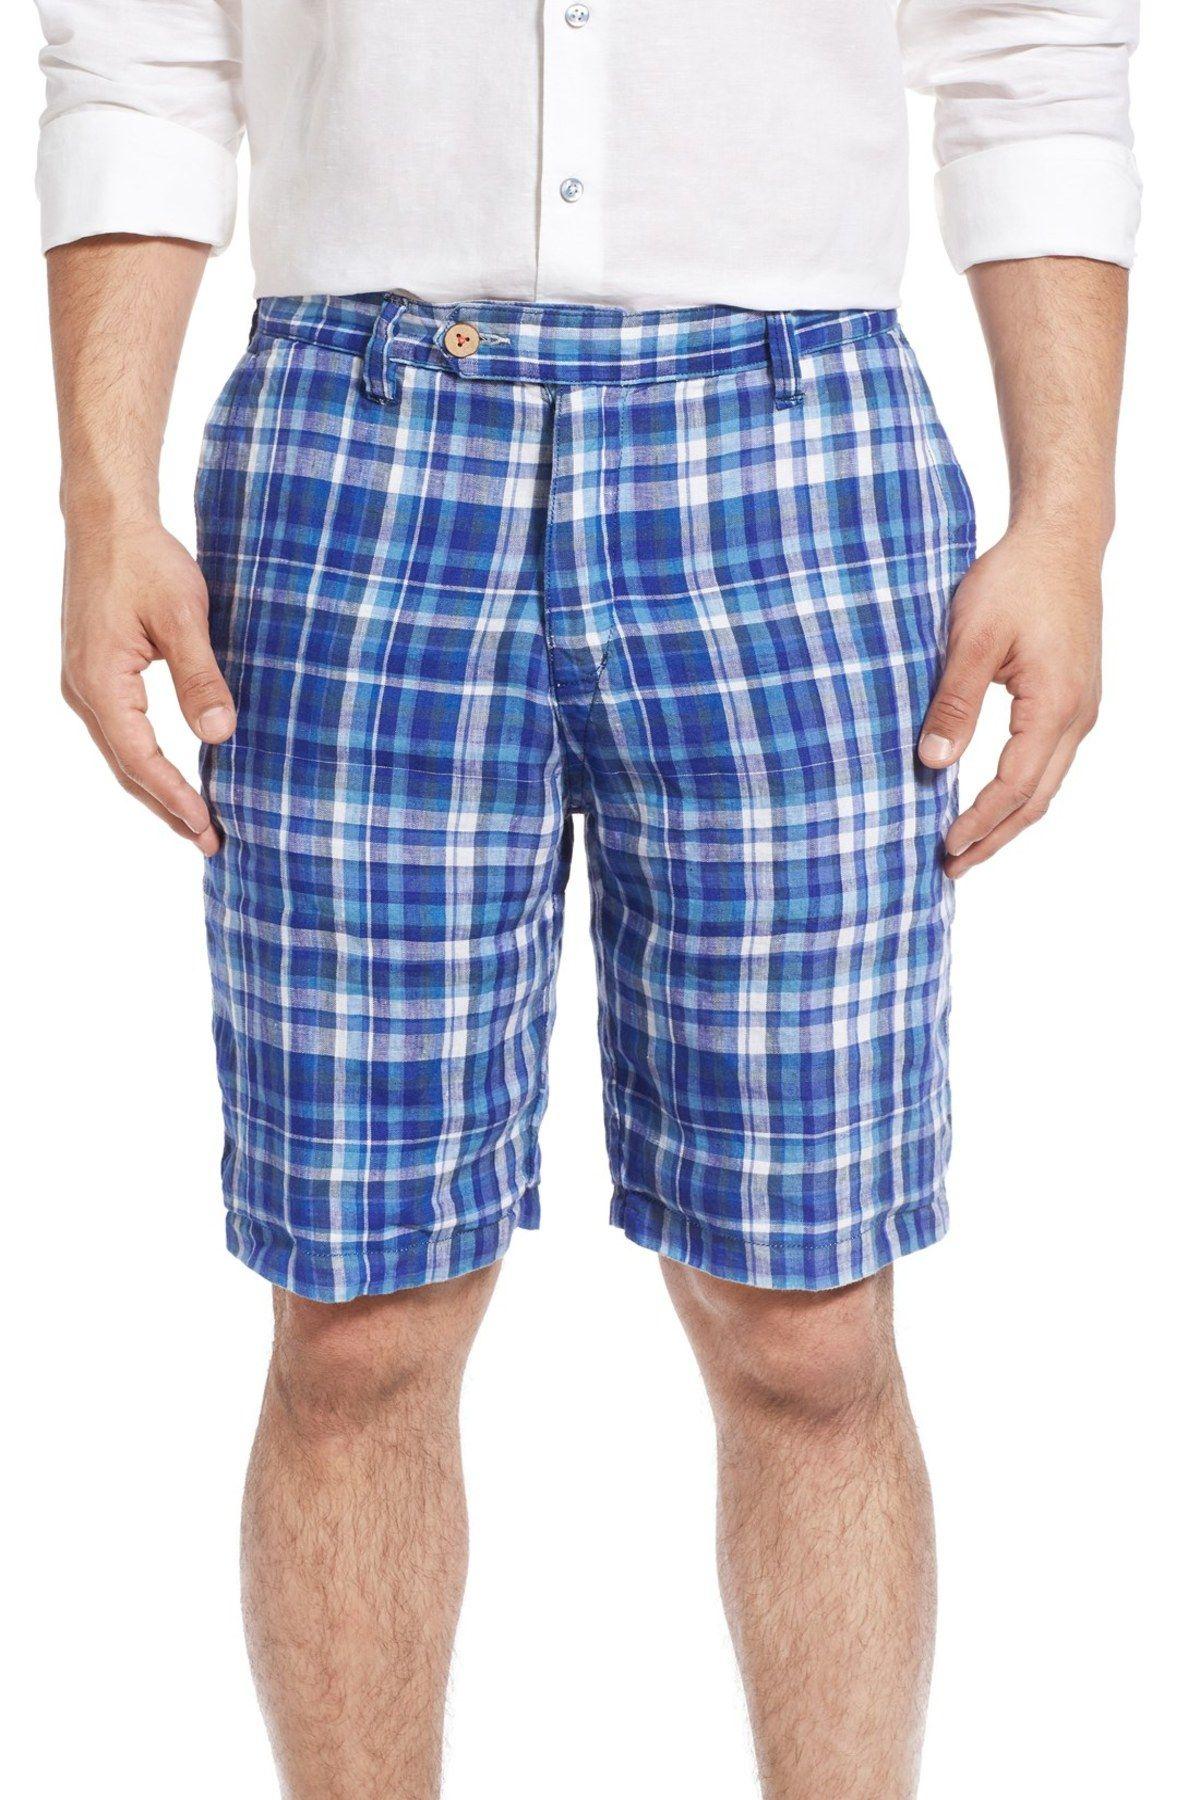 'Twofer' Reversible Linen Shorts